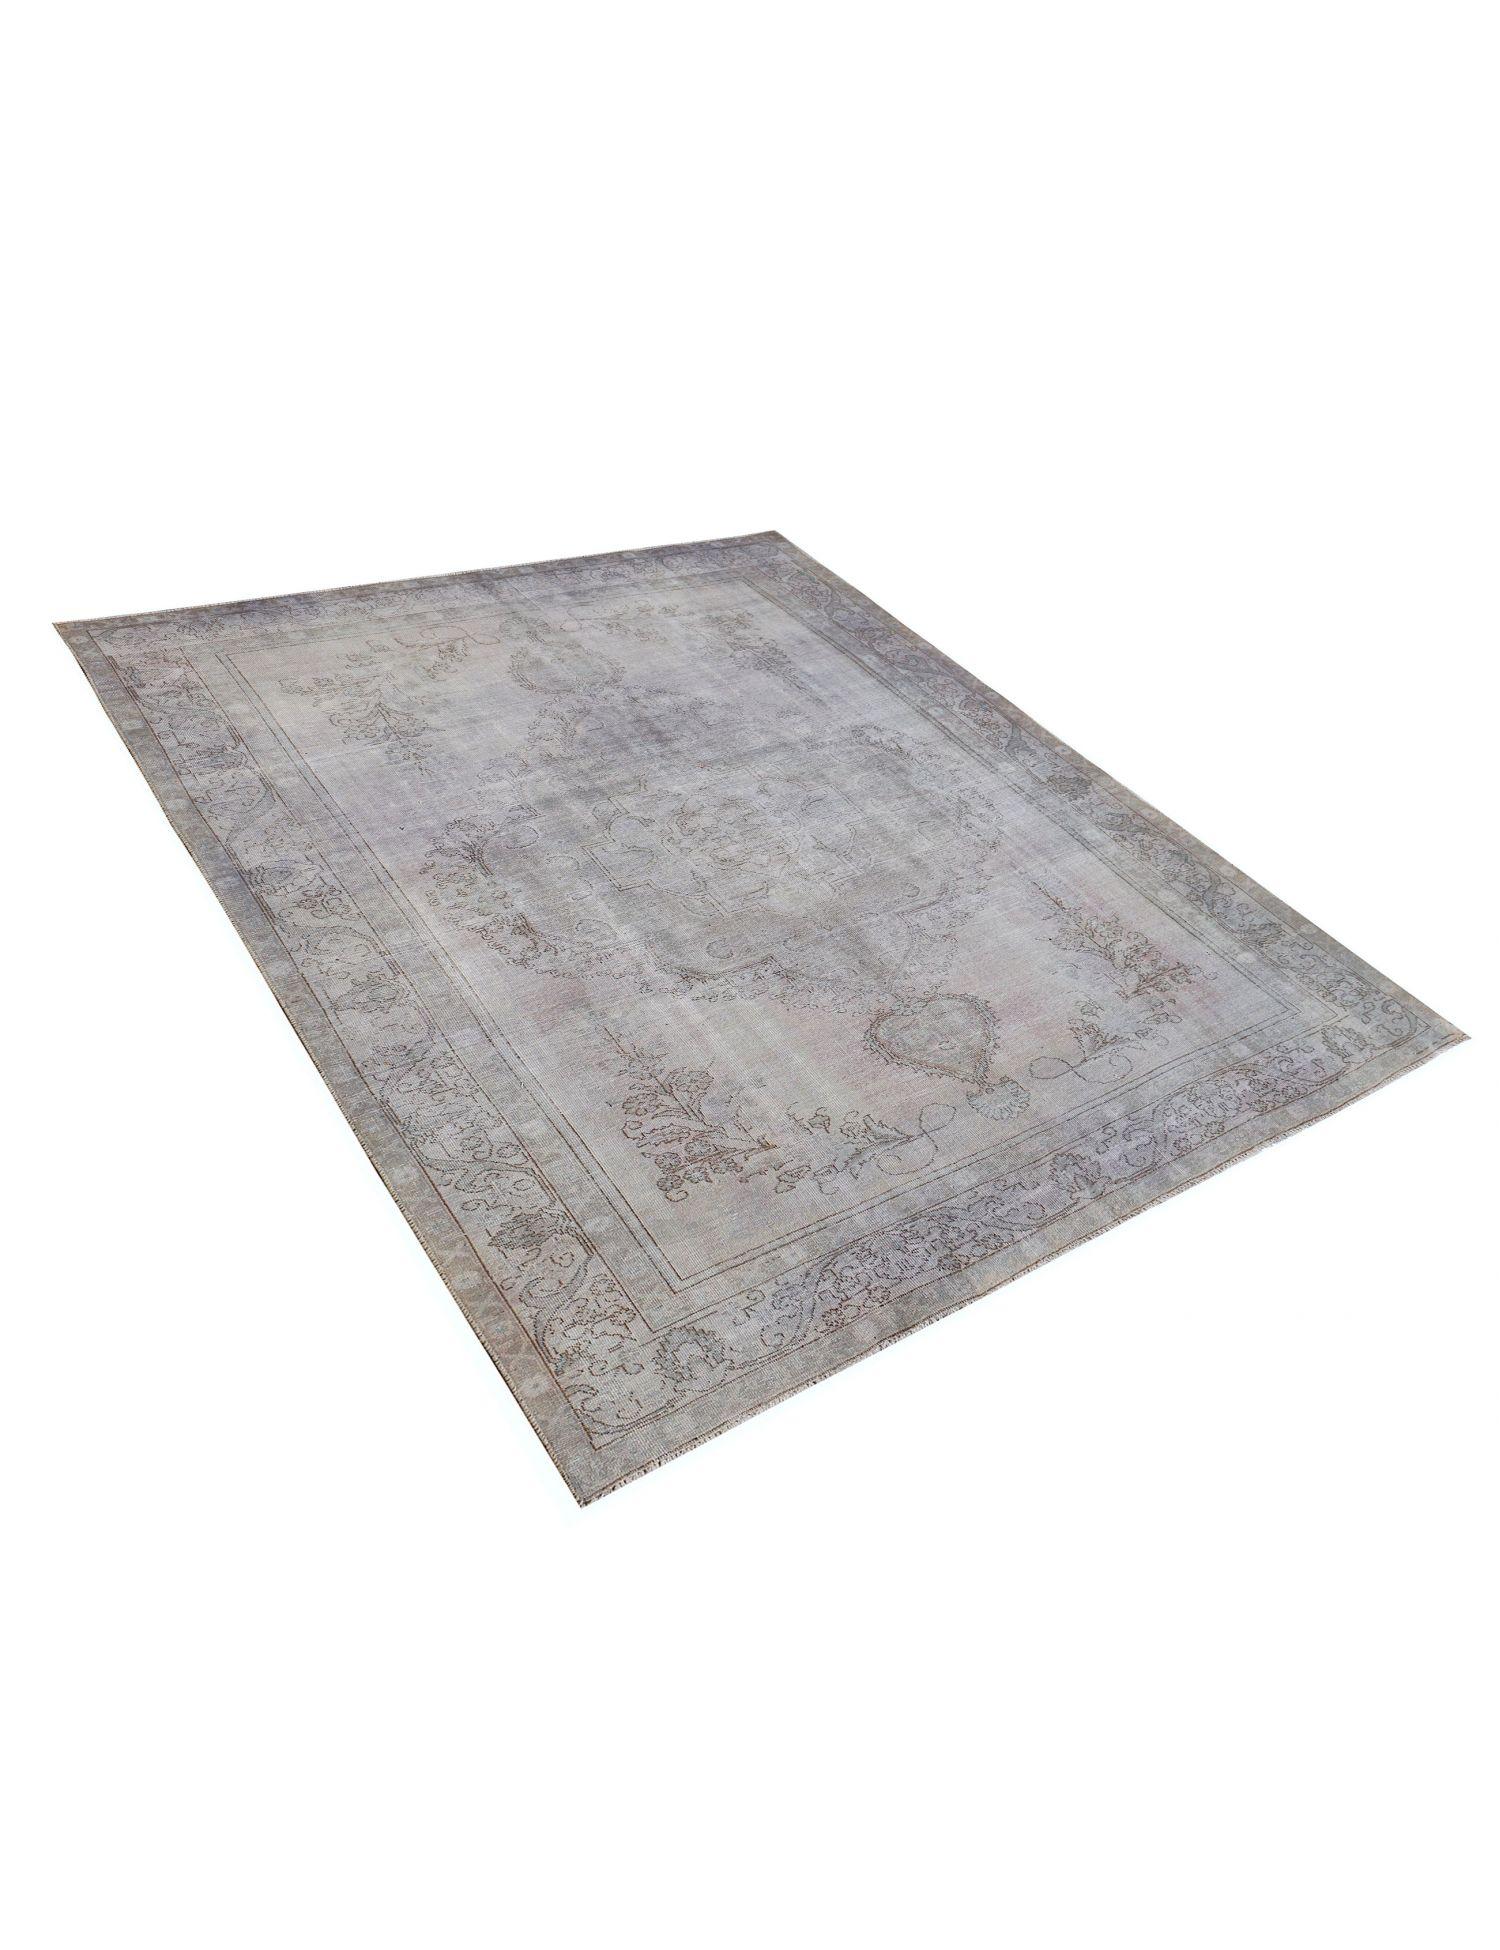 Vintage Perserteppich  grau <br/>380 x 286 cm